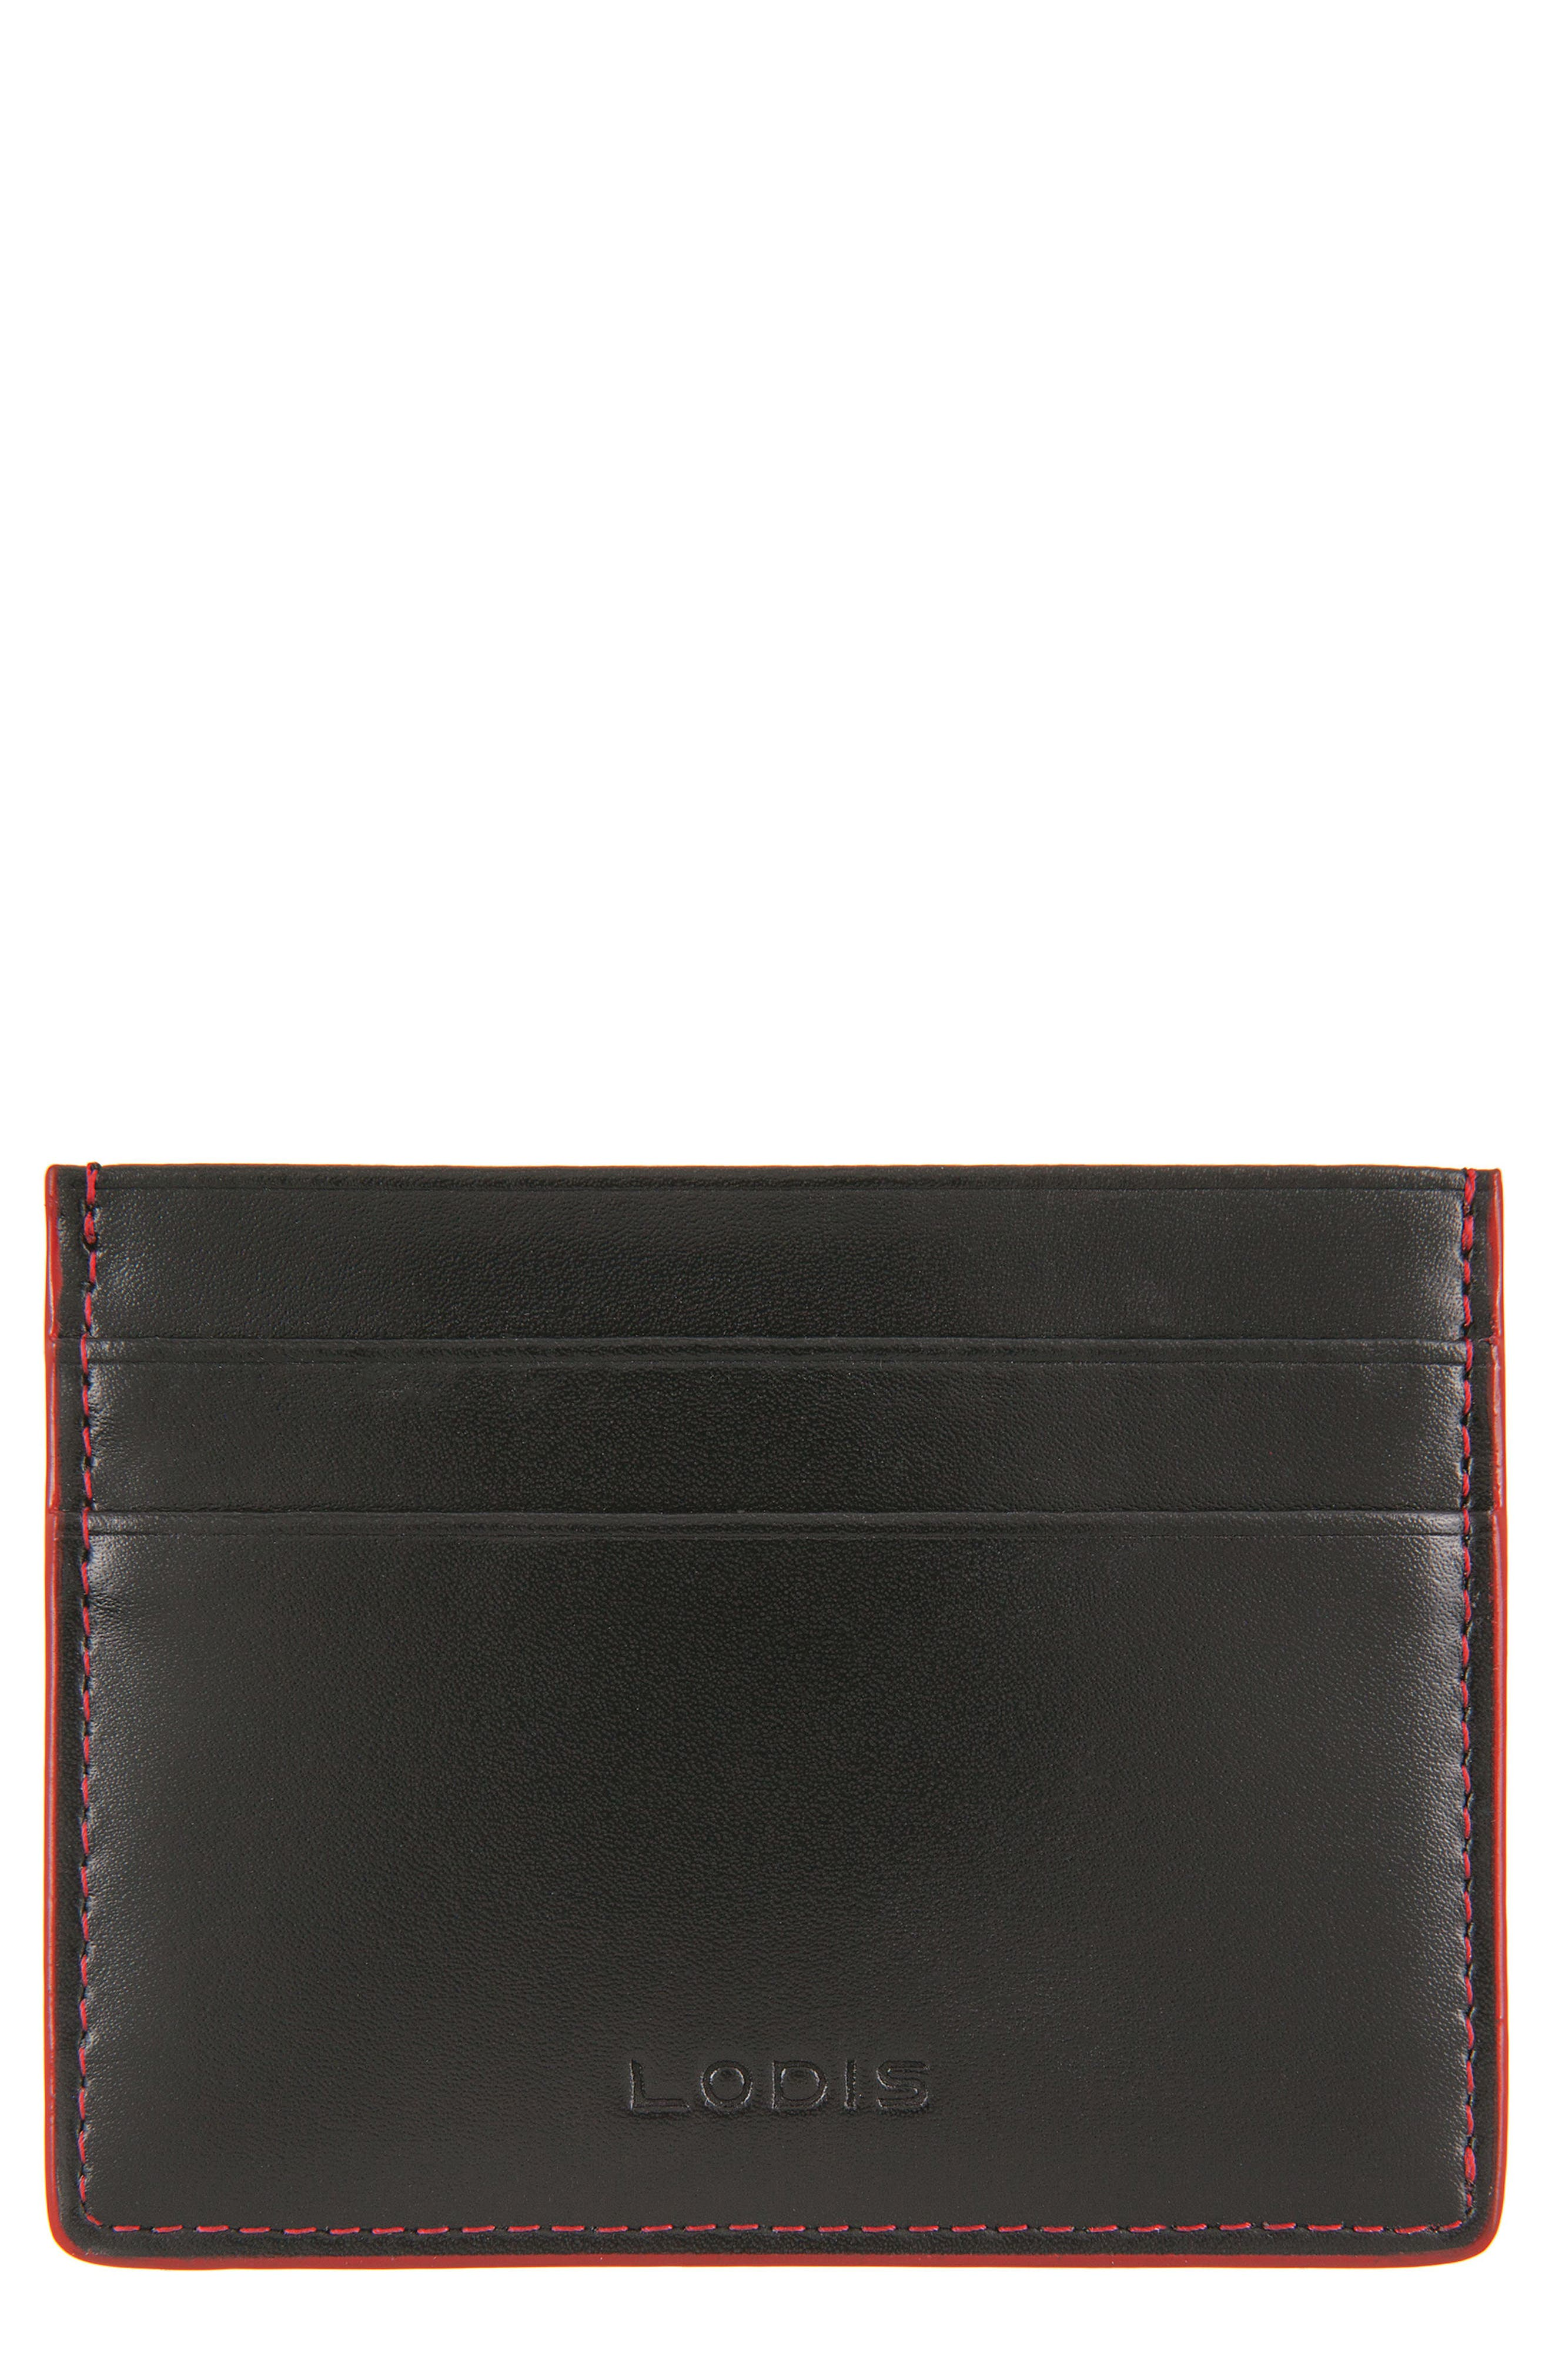 Lodis Mini Audrey Leather ID Card Case